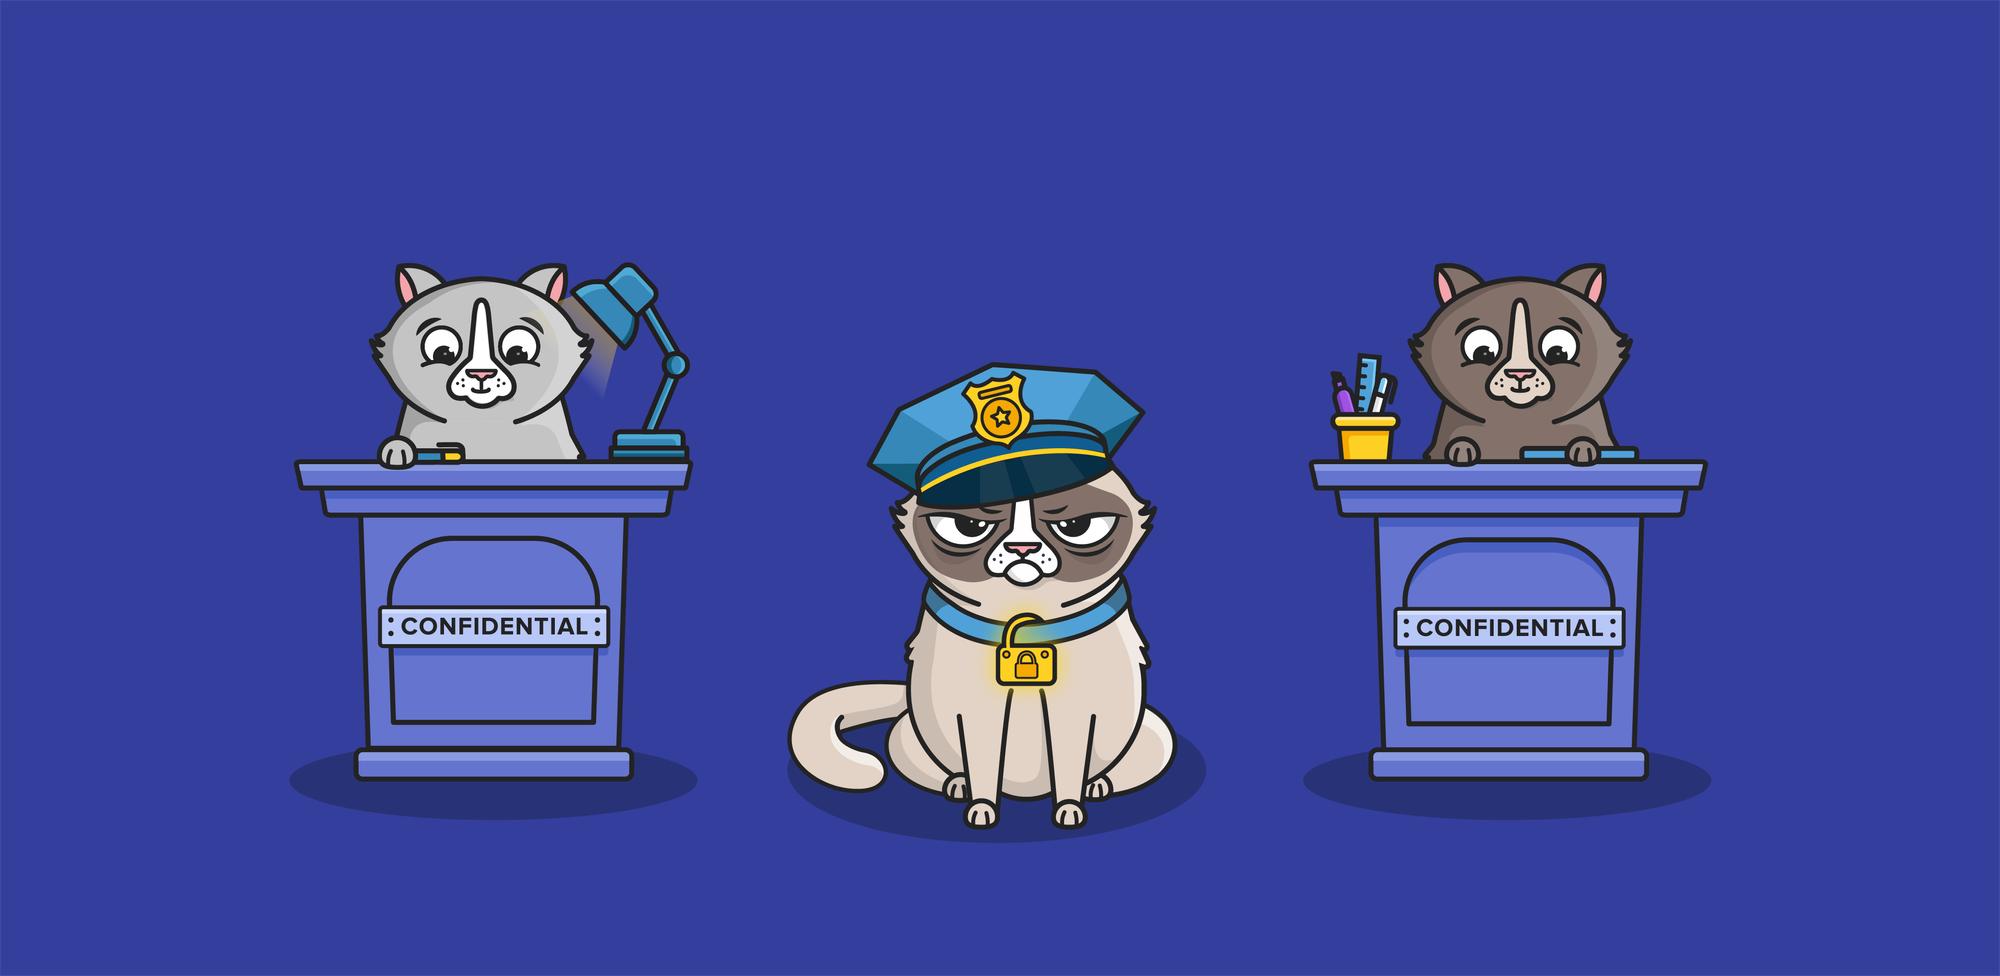 Stephen-BM_Self-service-cats_Cover-image-01